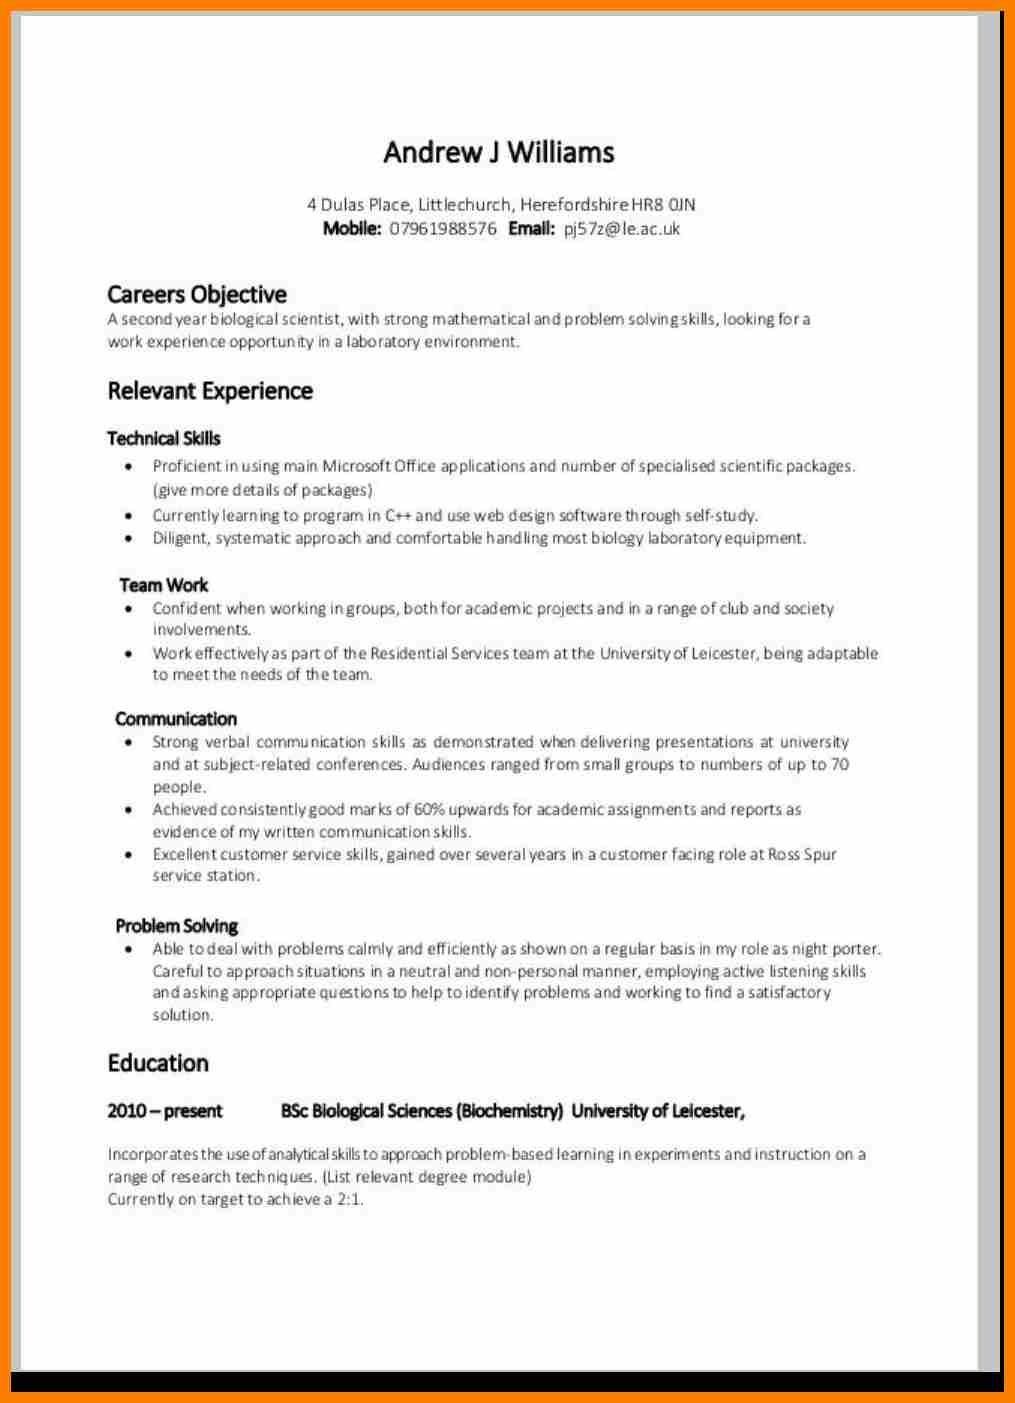 Cv Template For Over 60 Resume Format Resume Examples Resume Skills Resume Format